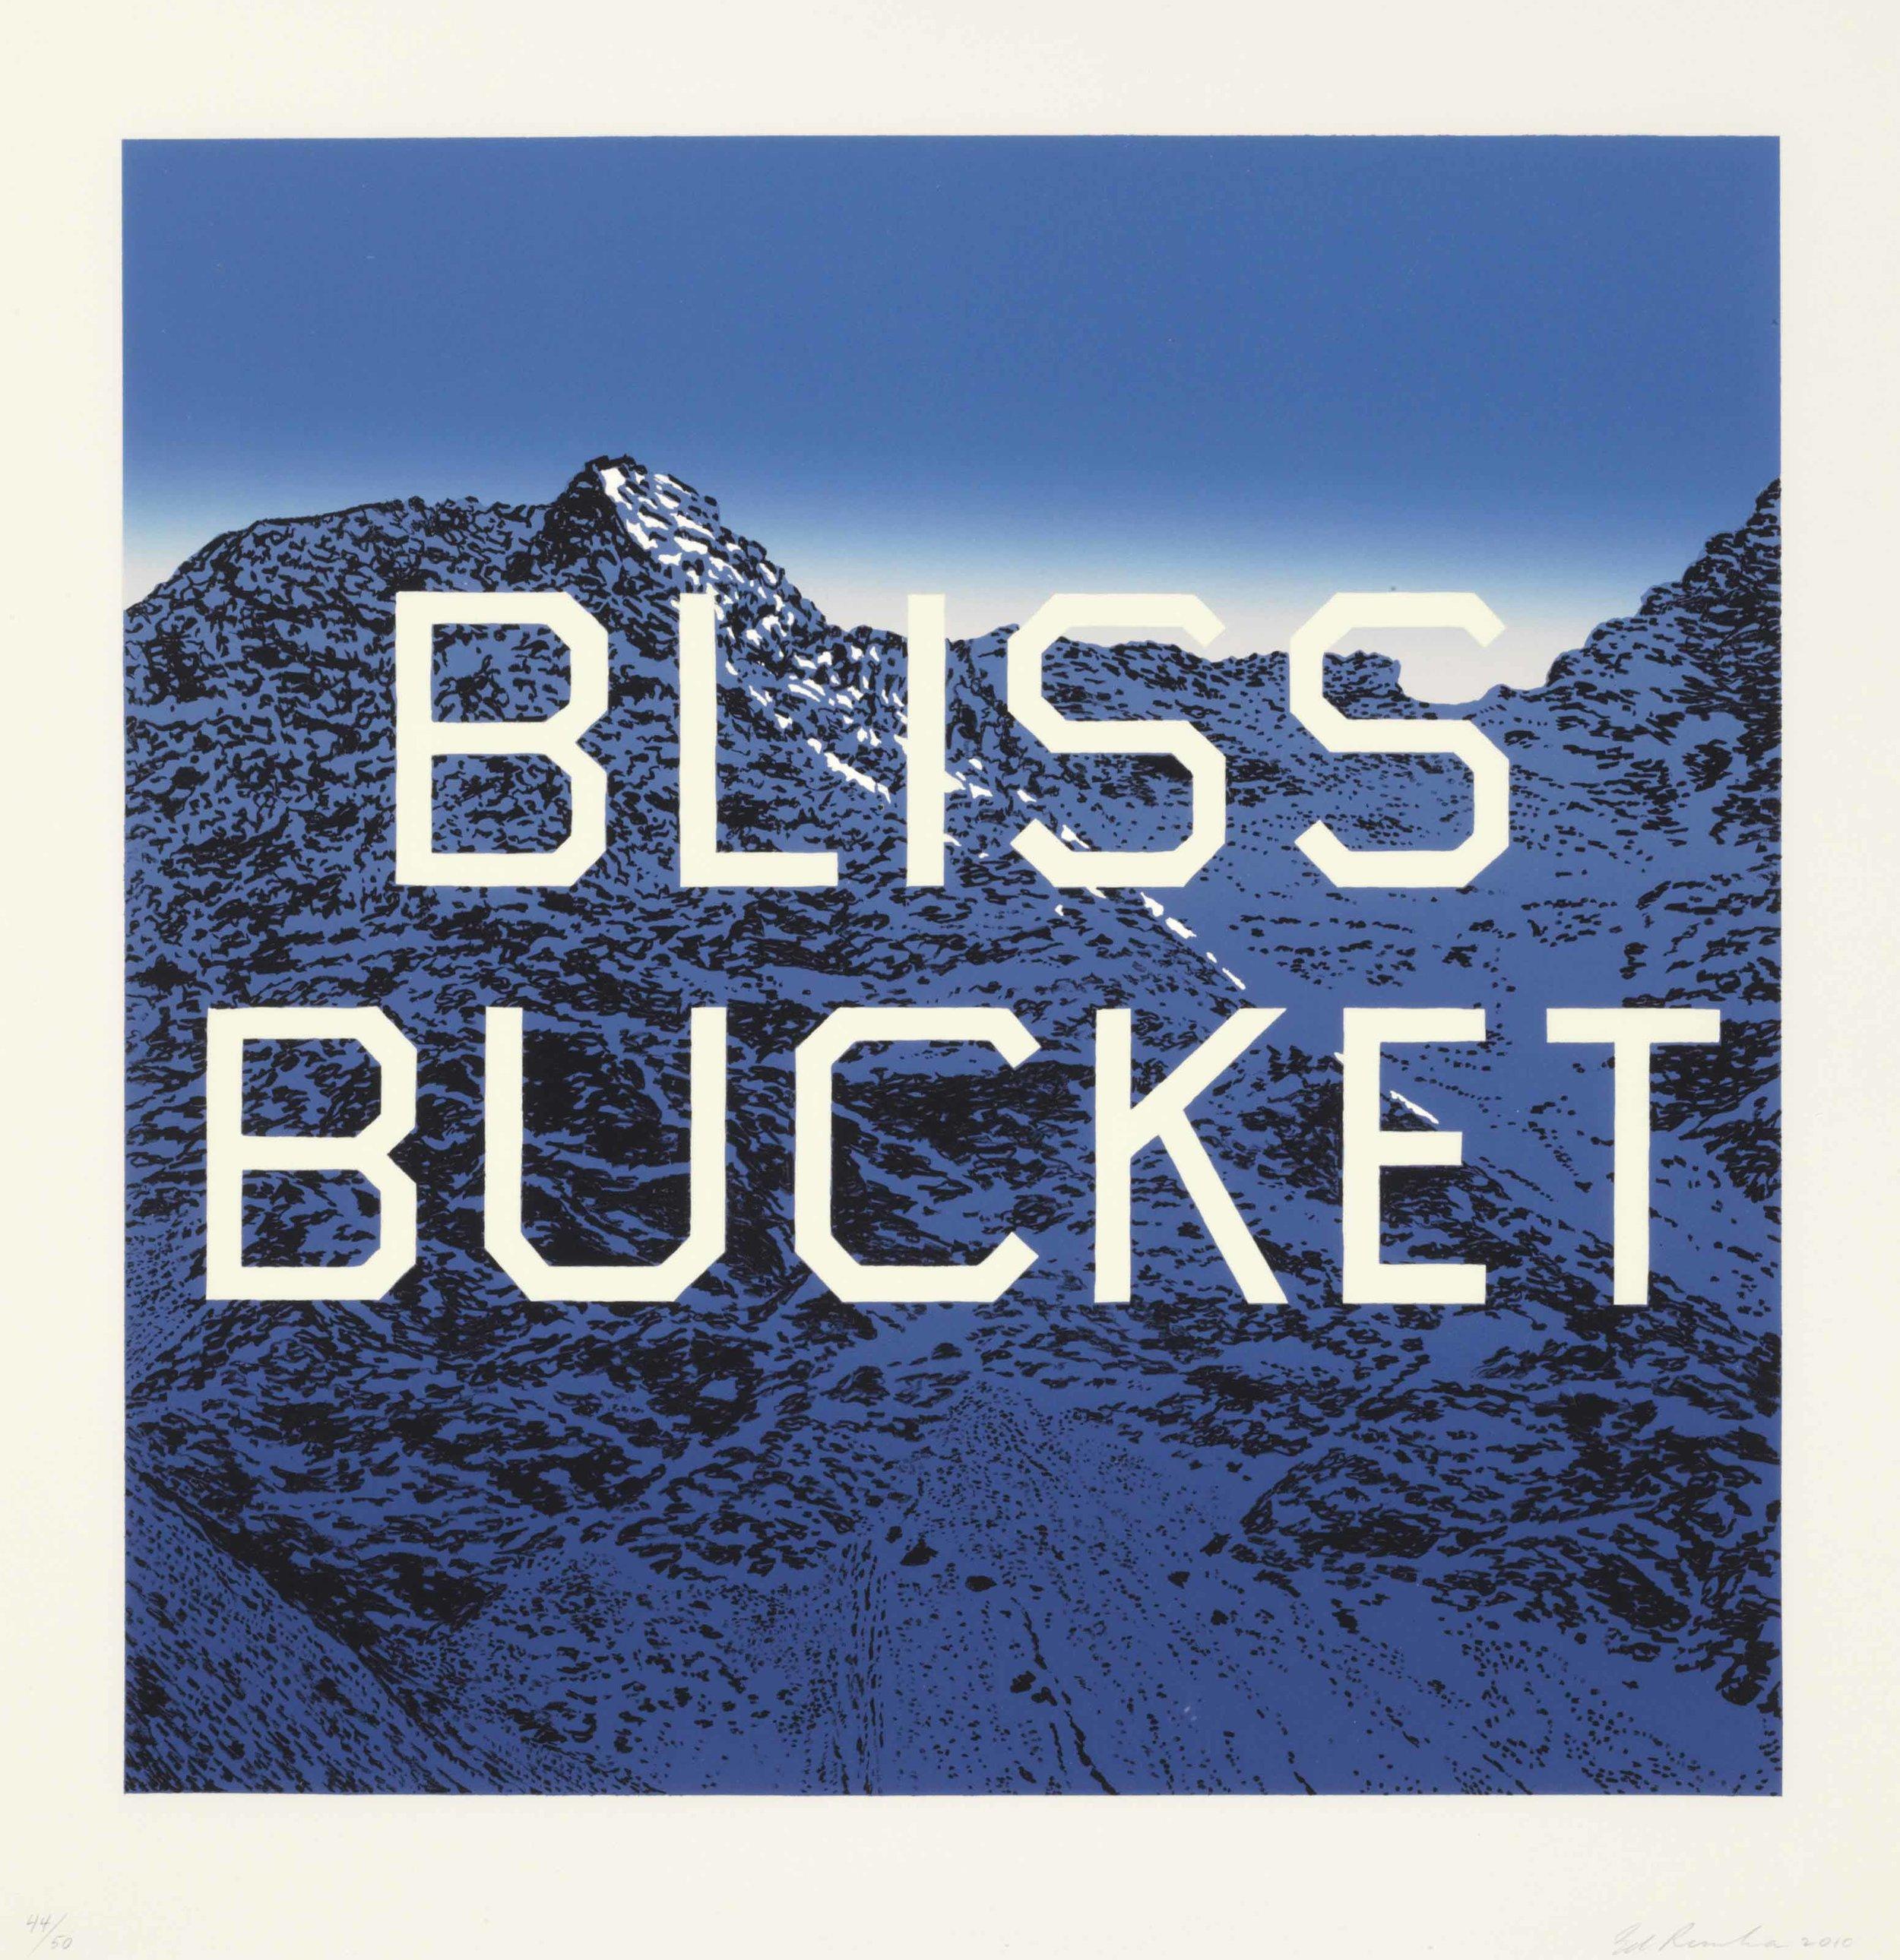 Bliss Bucket - Ed Ruscha